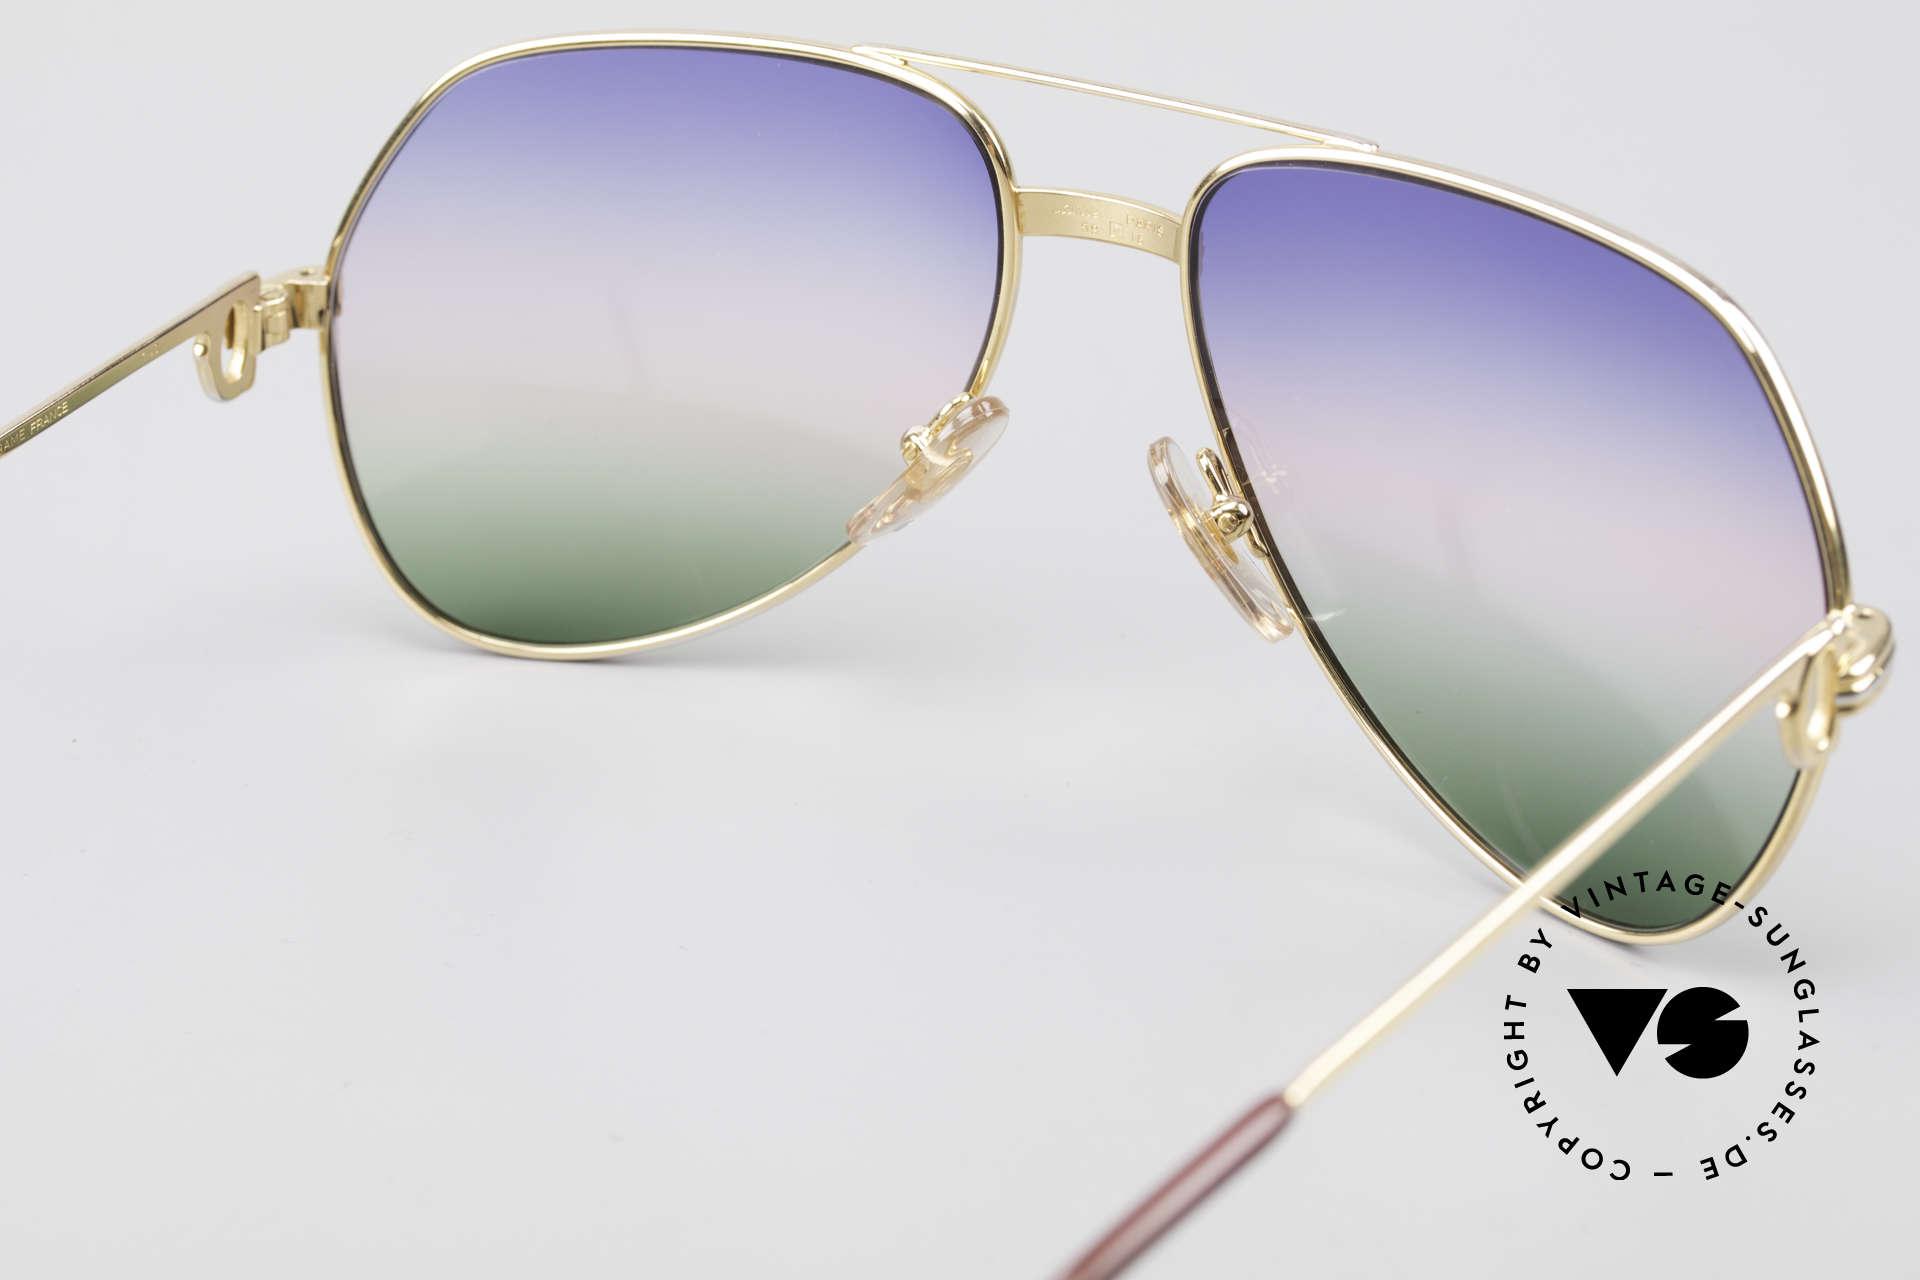 Cartier Vendome LC - M Michael Douglas Sunglasses, 2nd hand model, but in mint condition + CARTIER BOX, Made for Men